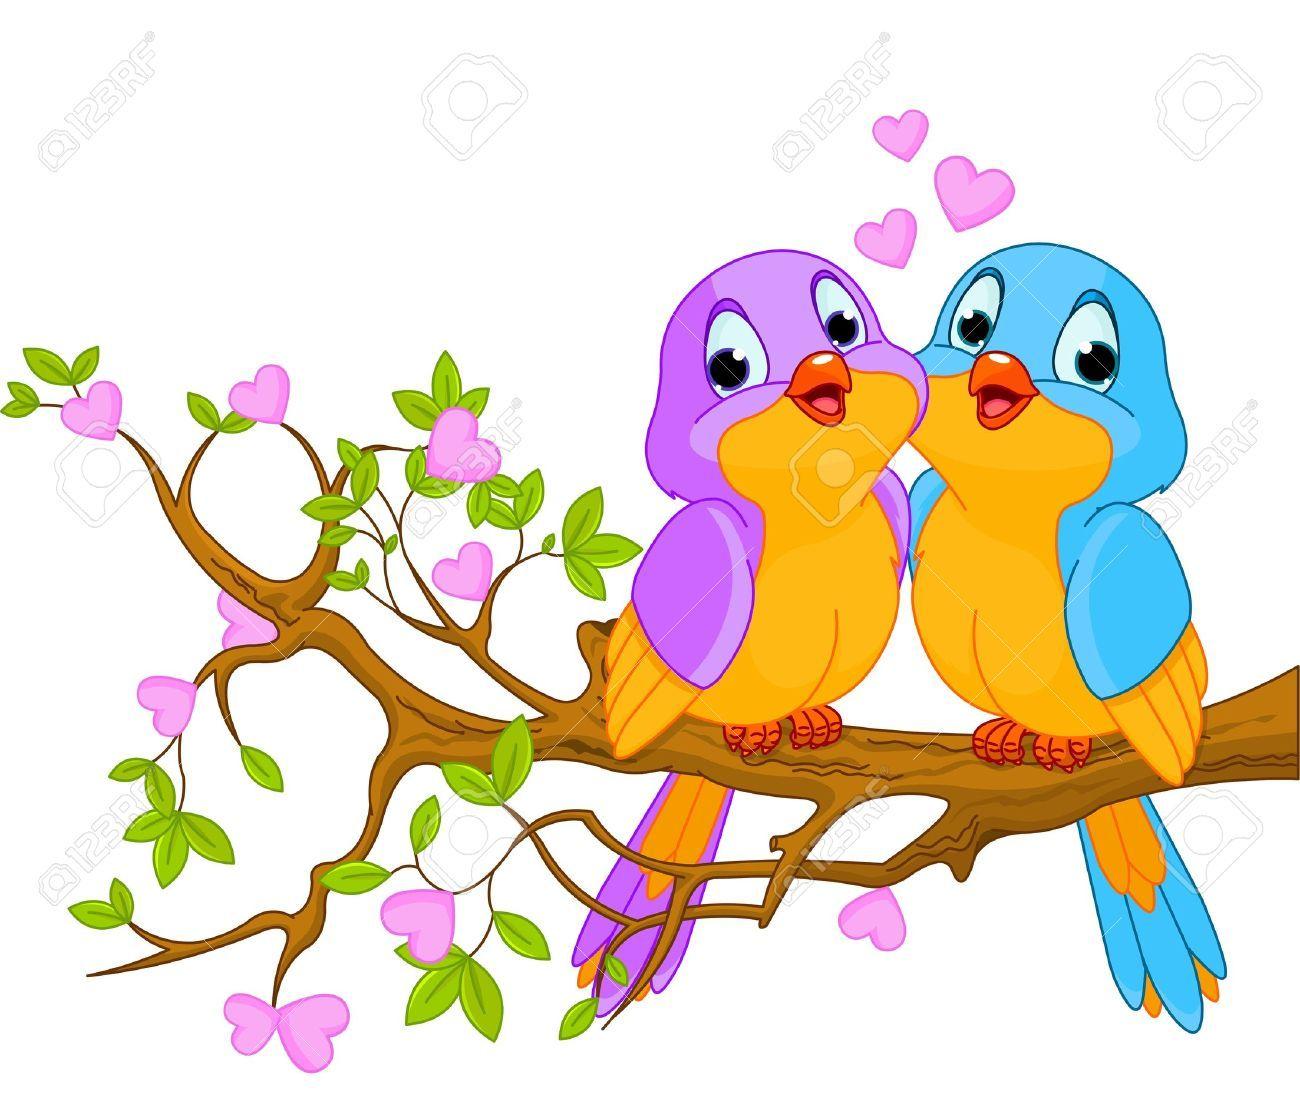 Love birds free clipart 4 » Clipart Portal.